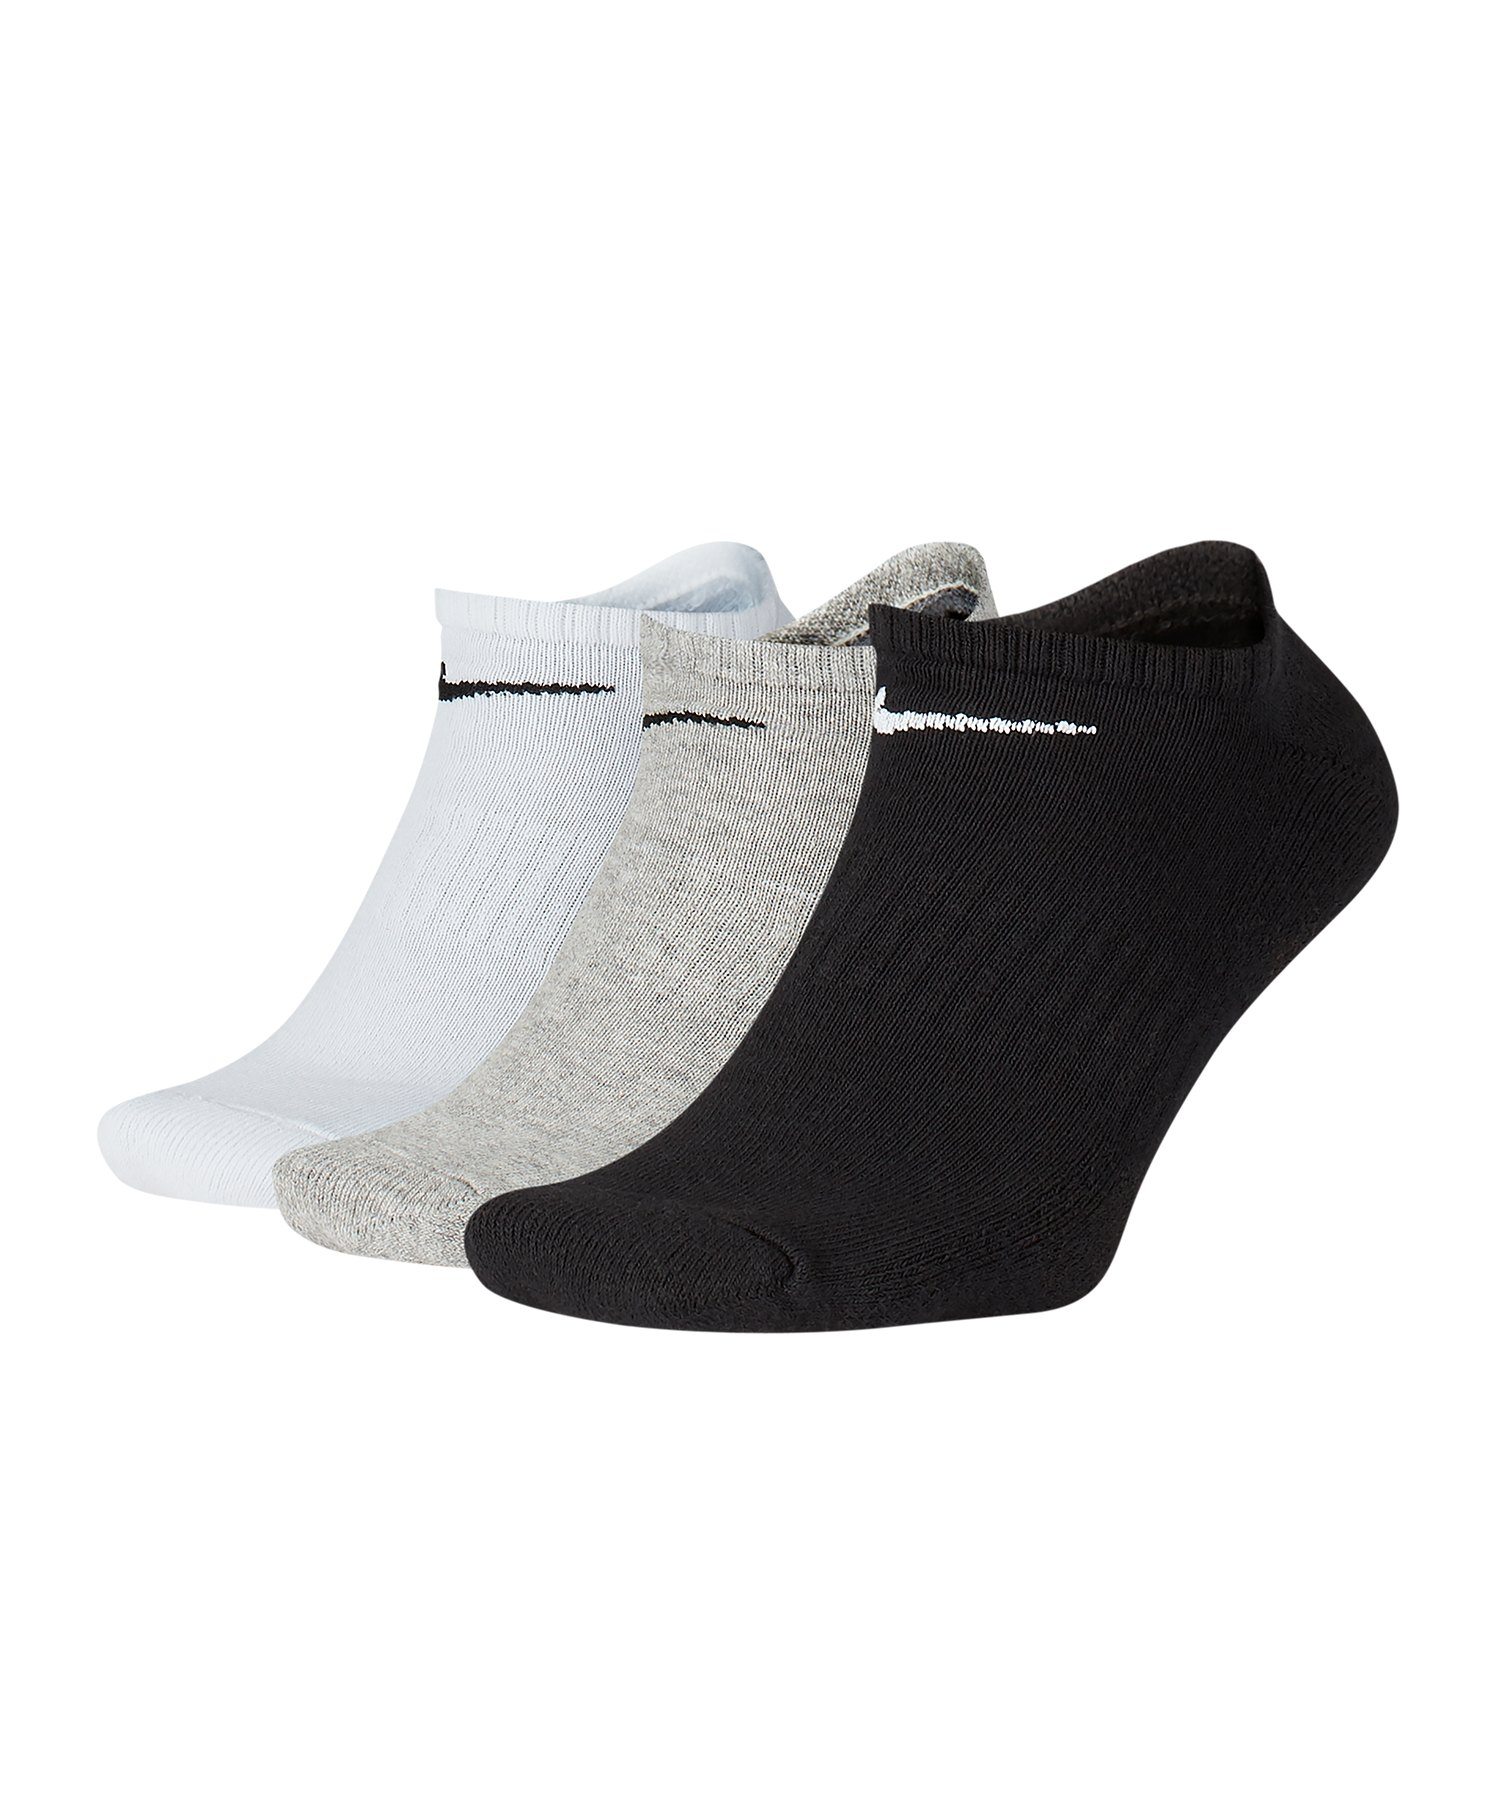 Nike Everyday Cushion No-Show Socken 3er Pack F901 - schwarz